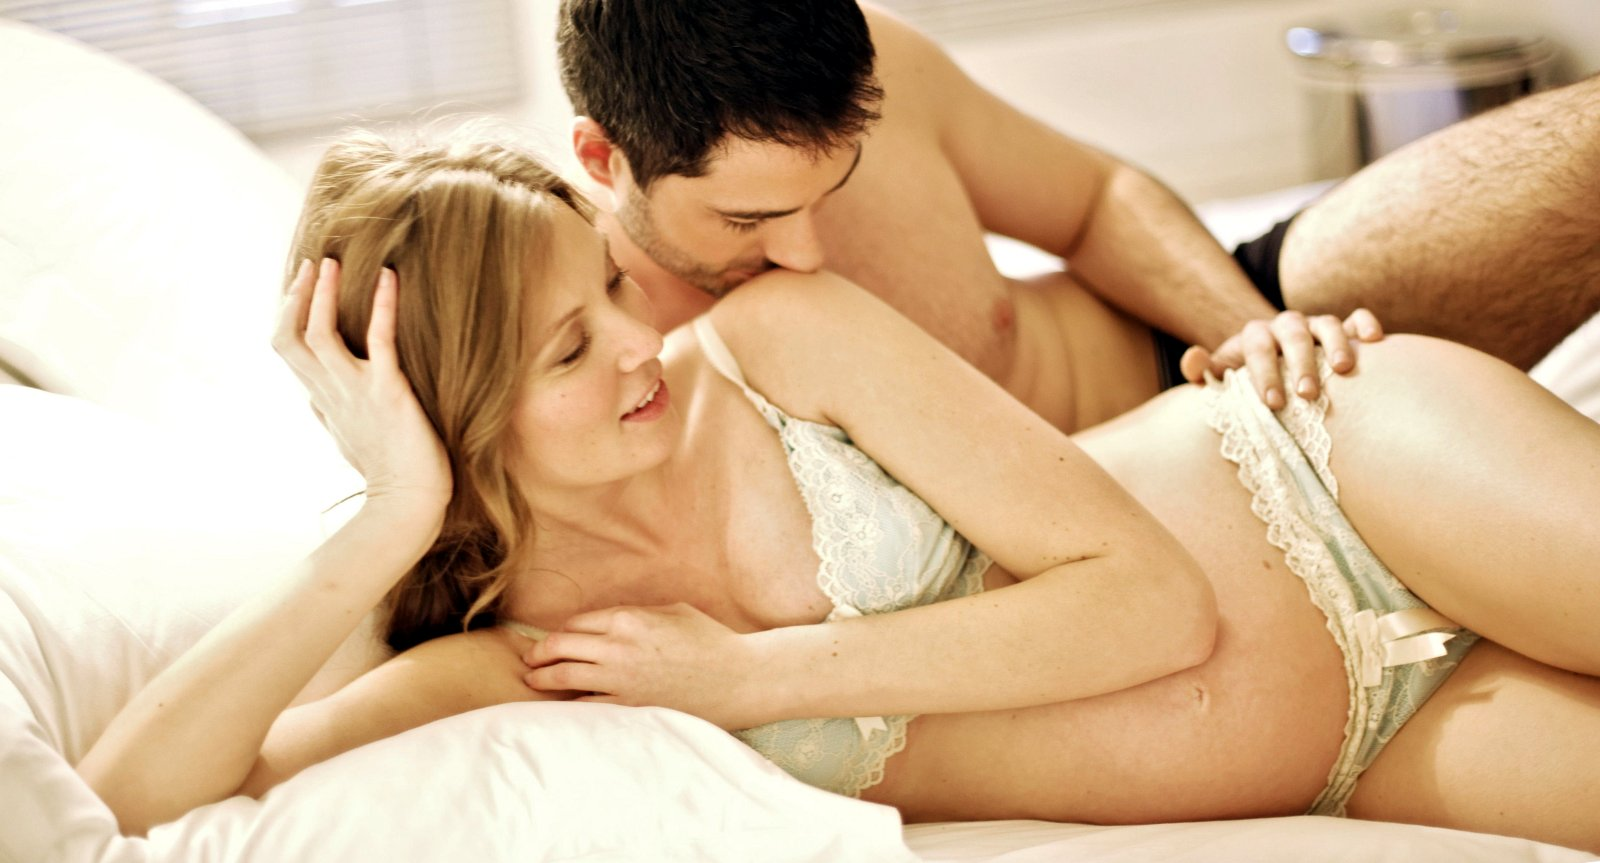 Секс во время беременности: разбираем все за и против